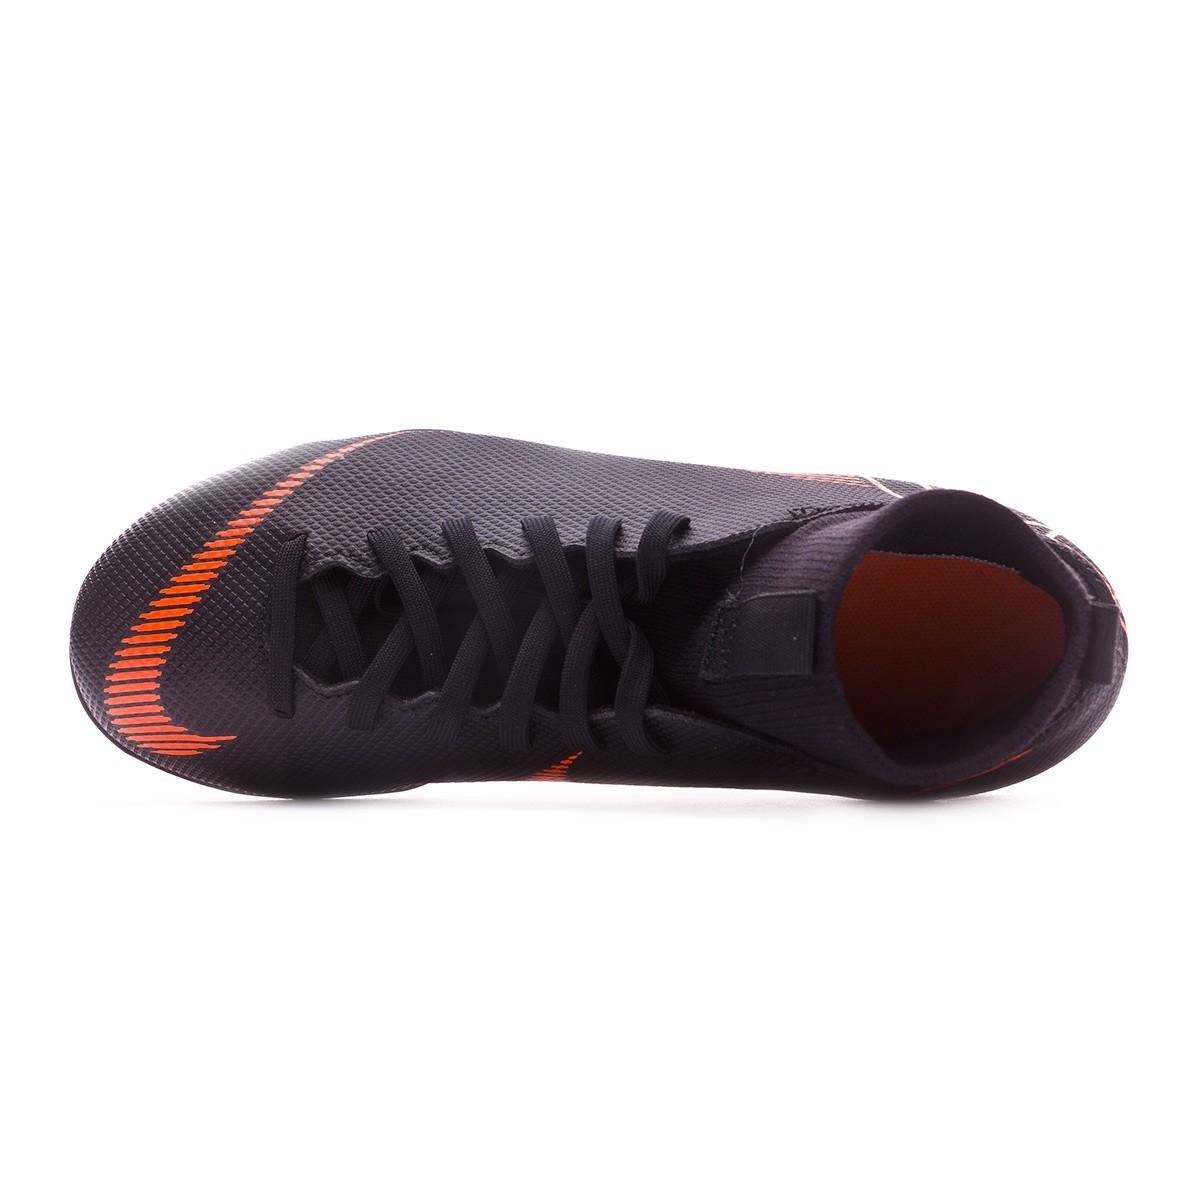 a1a31f69d1ac Scarpe Nike Mercurial Superfly VI Club MG Junior Black-Total orange-White - Negozio  di calcio Fútbol Emotion